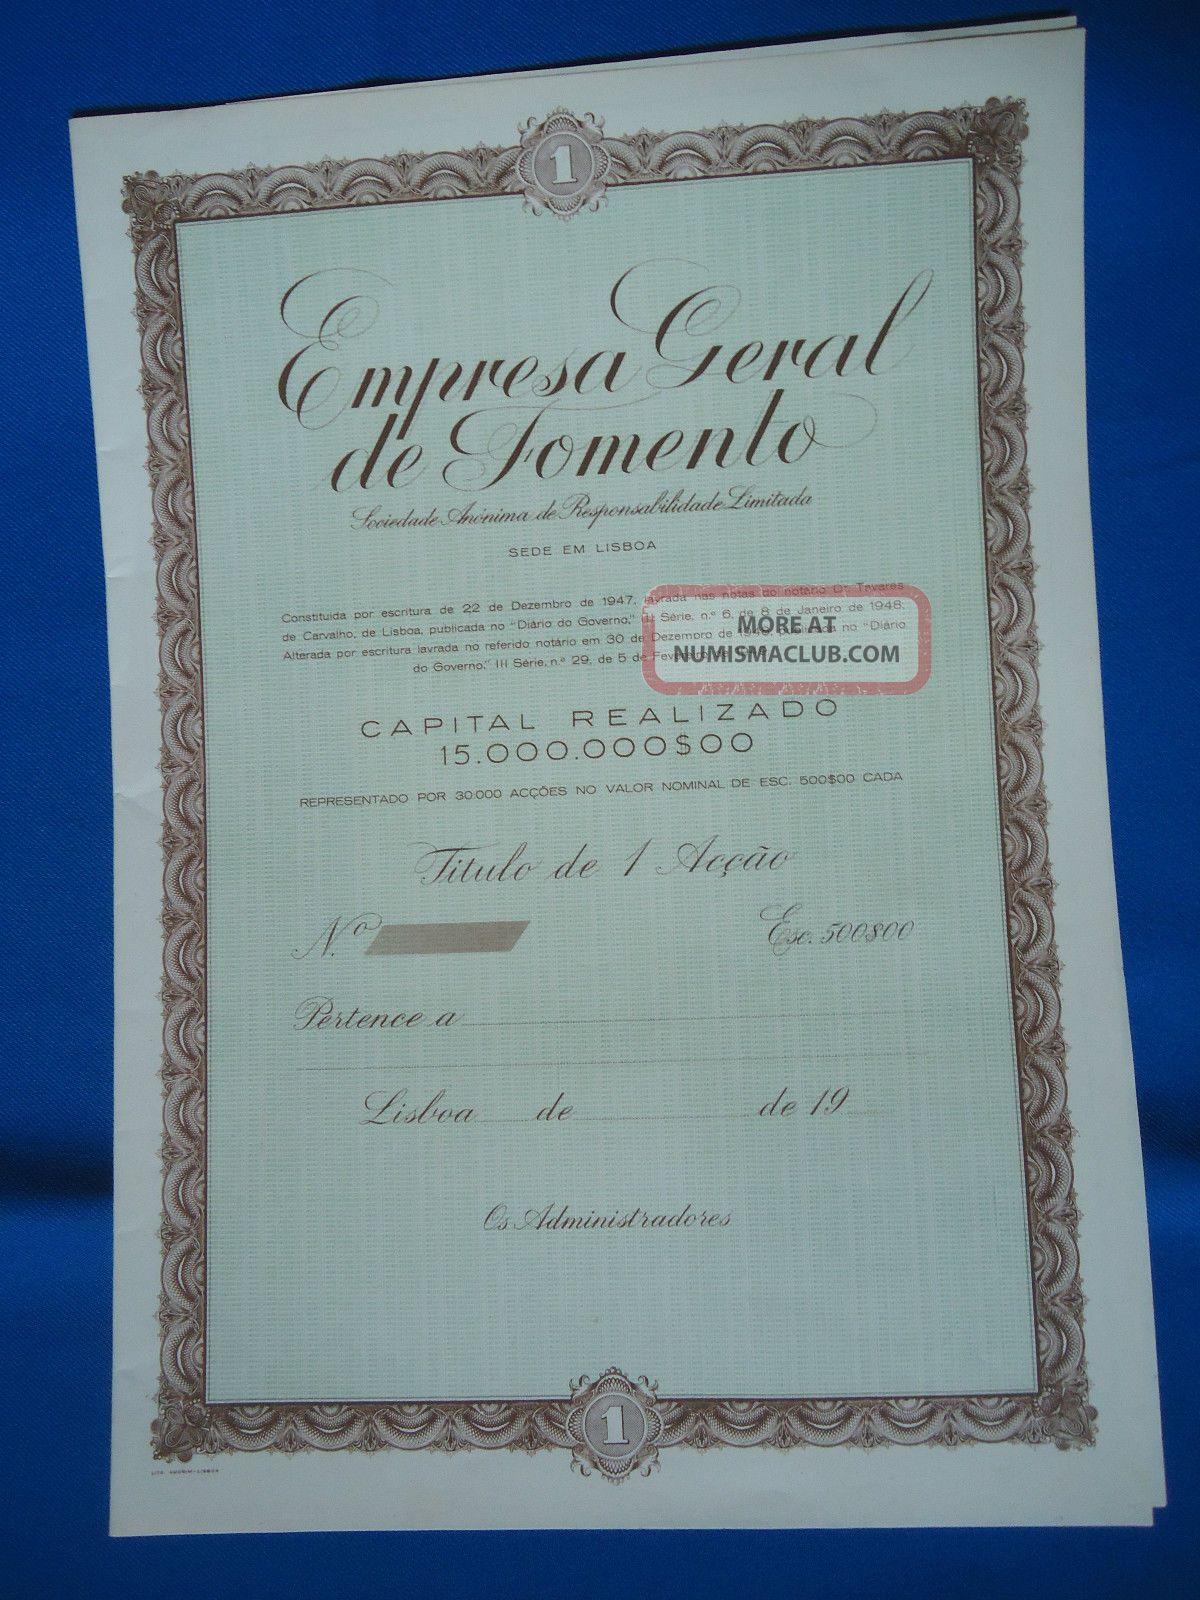 Portugal Share Empresa Geral Fomento 500 Escudos 19?? Look Scans World photo